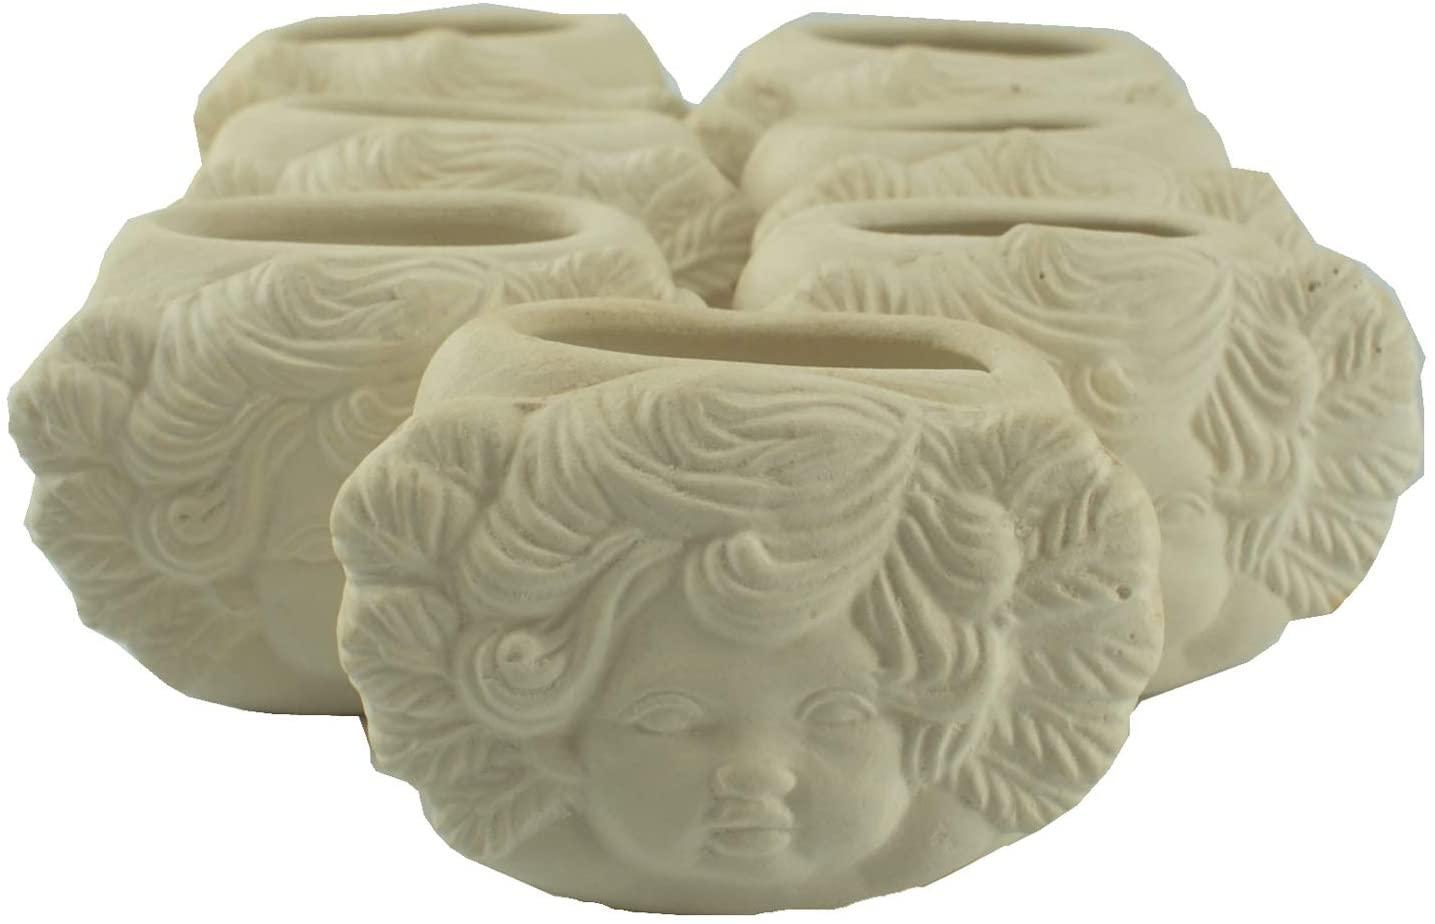 Connie N Randy Set of 7 DIY Ceramic Unpainted Napkin Rings with Cherubs